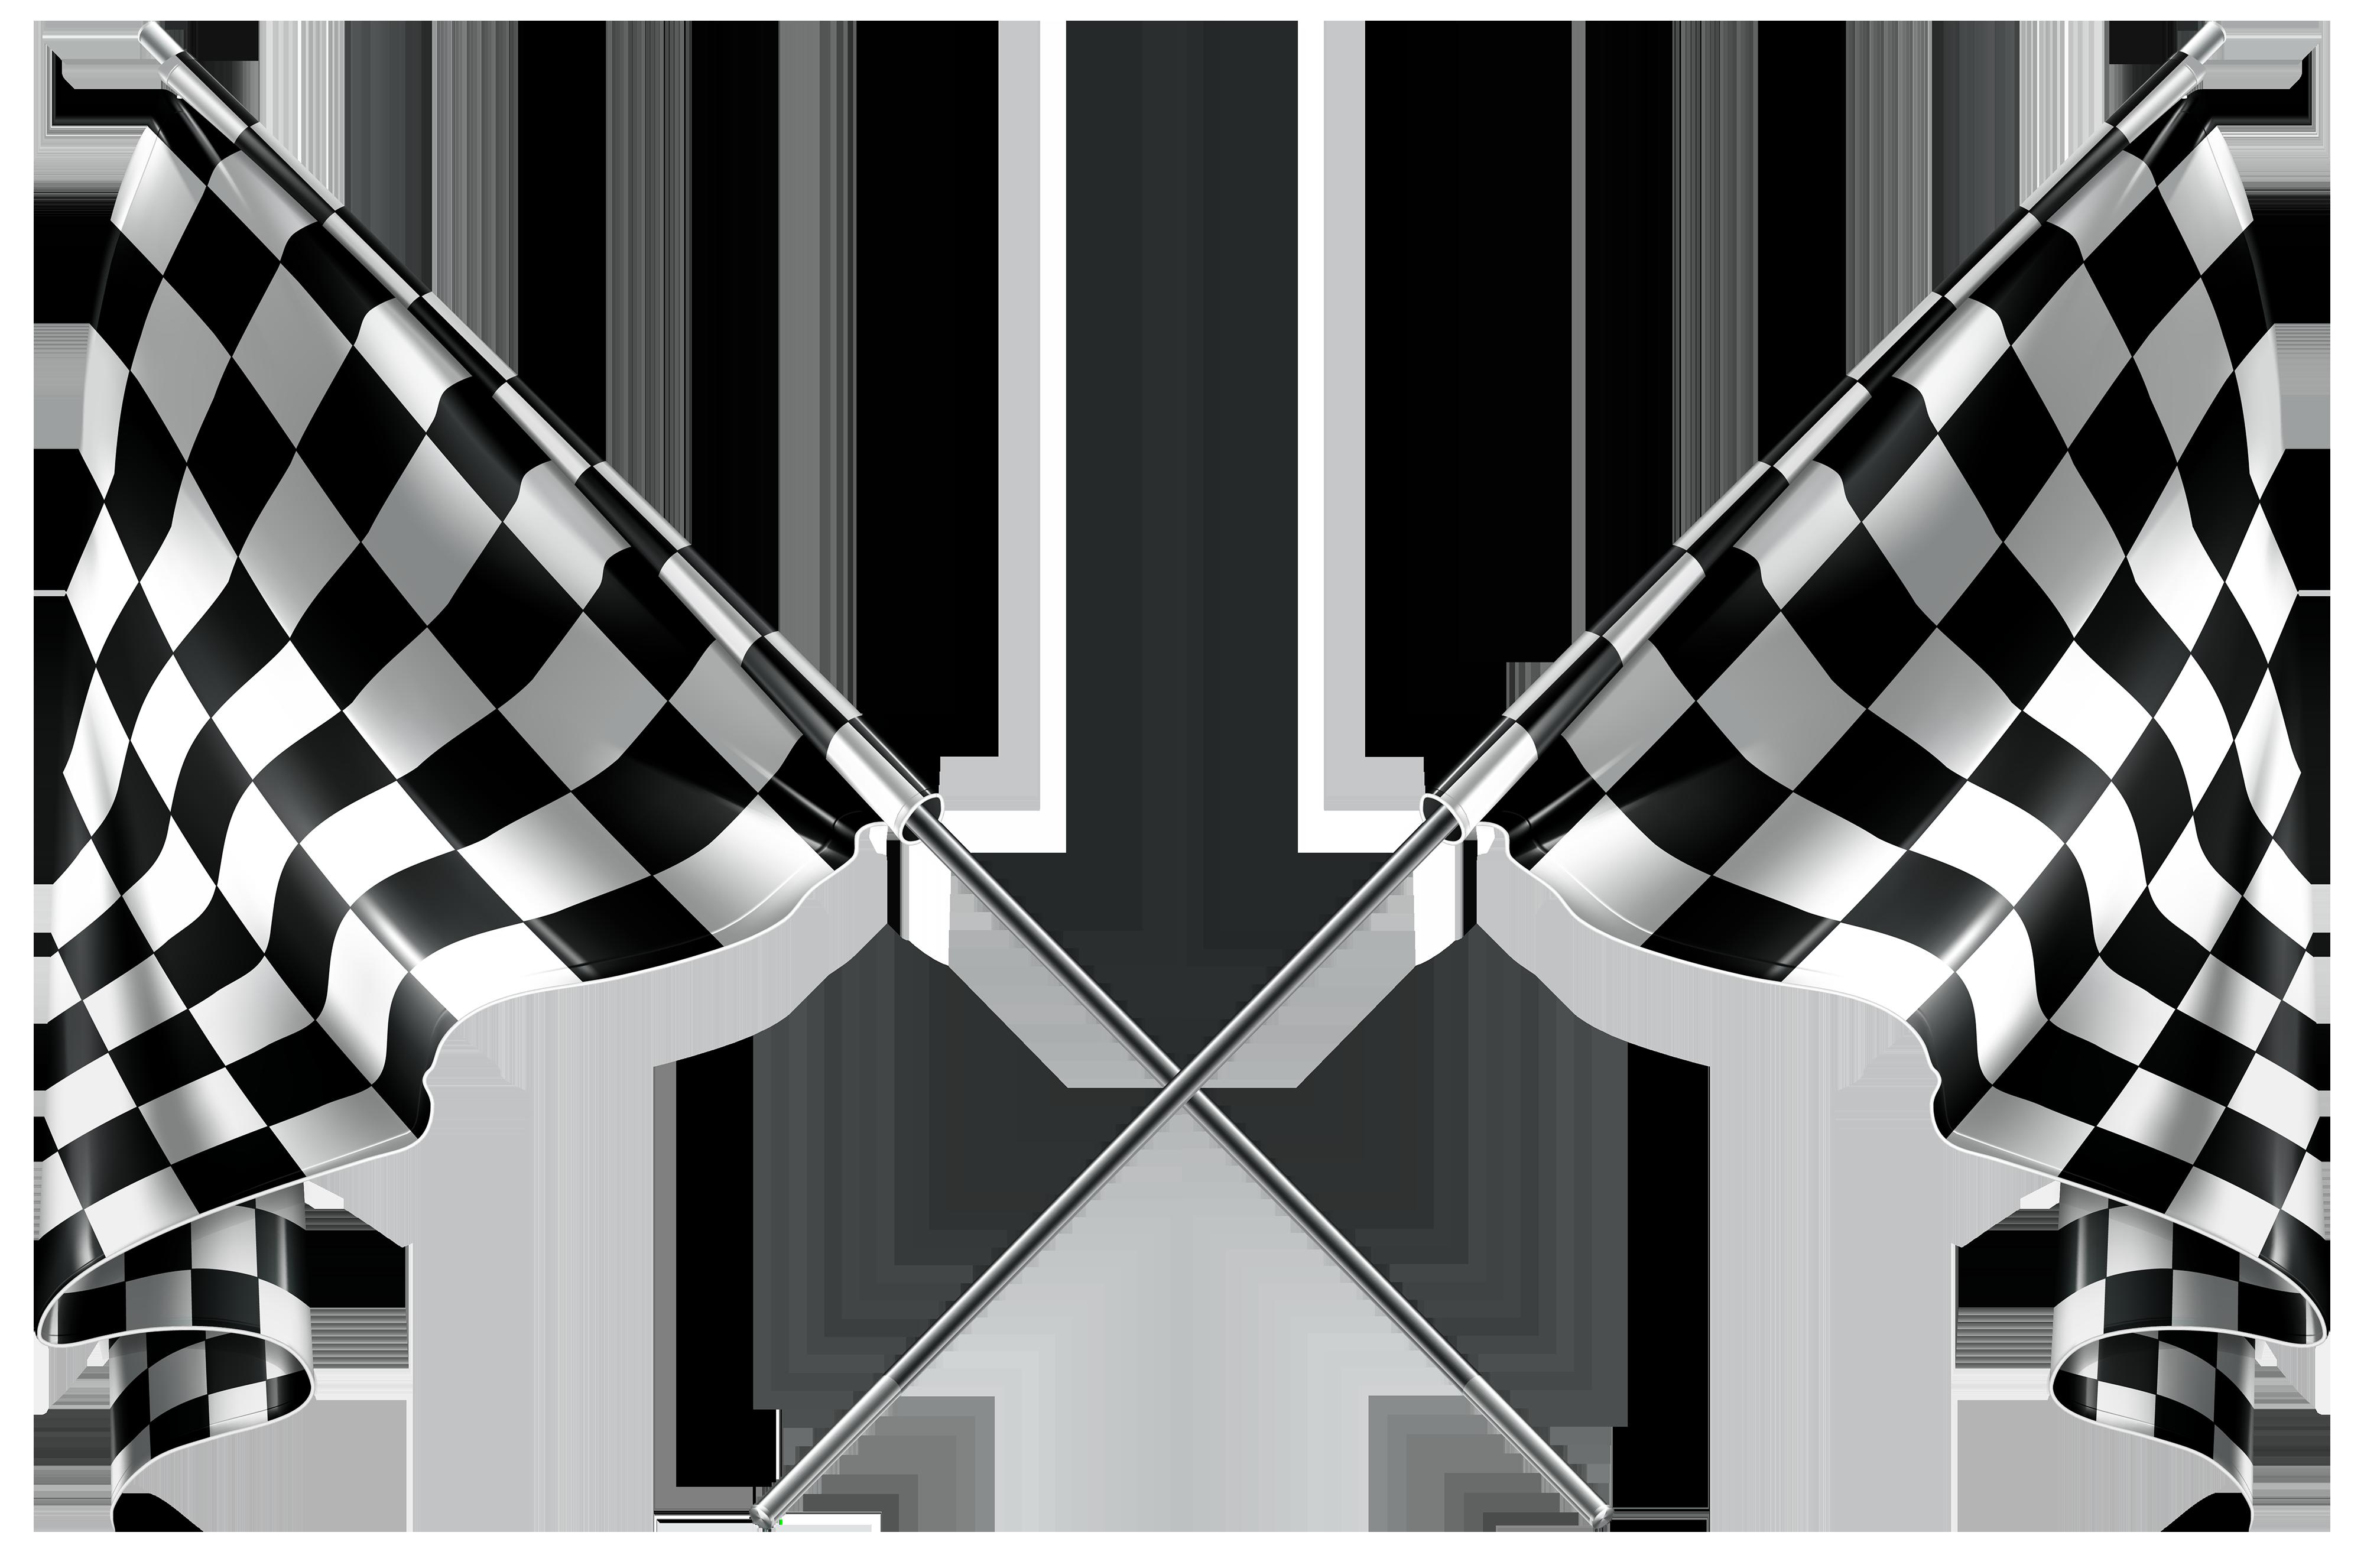 Clipart cars flag. Checkered flags web pics